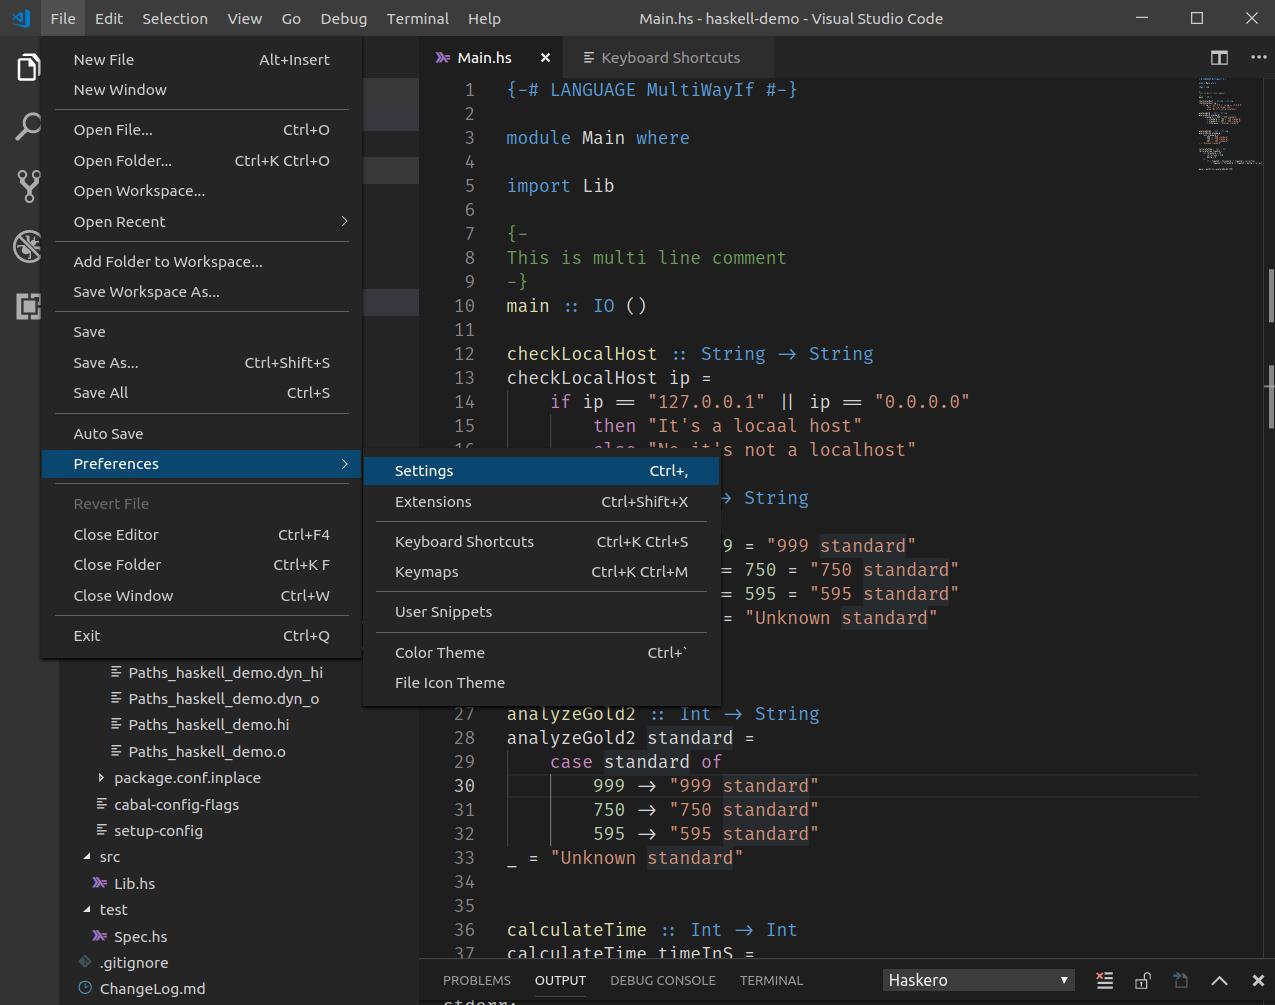 Visual Studio Code: How to enable fonts ligatures in Ubuntu